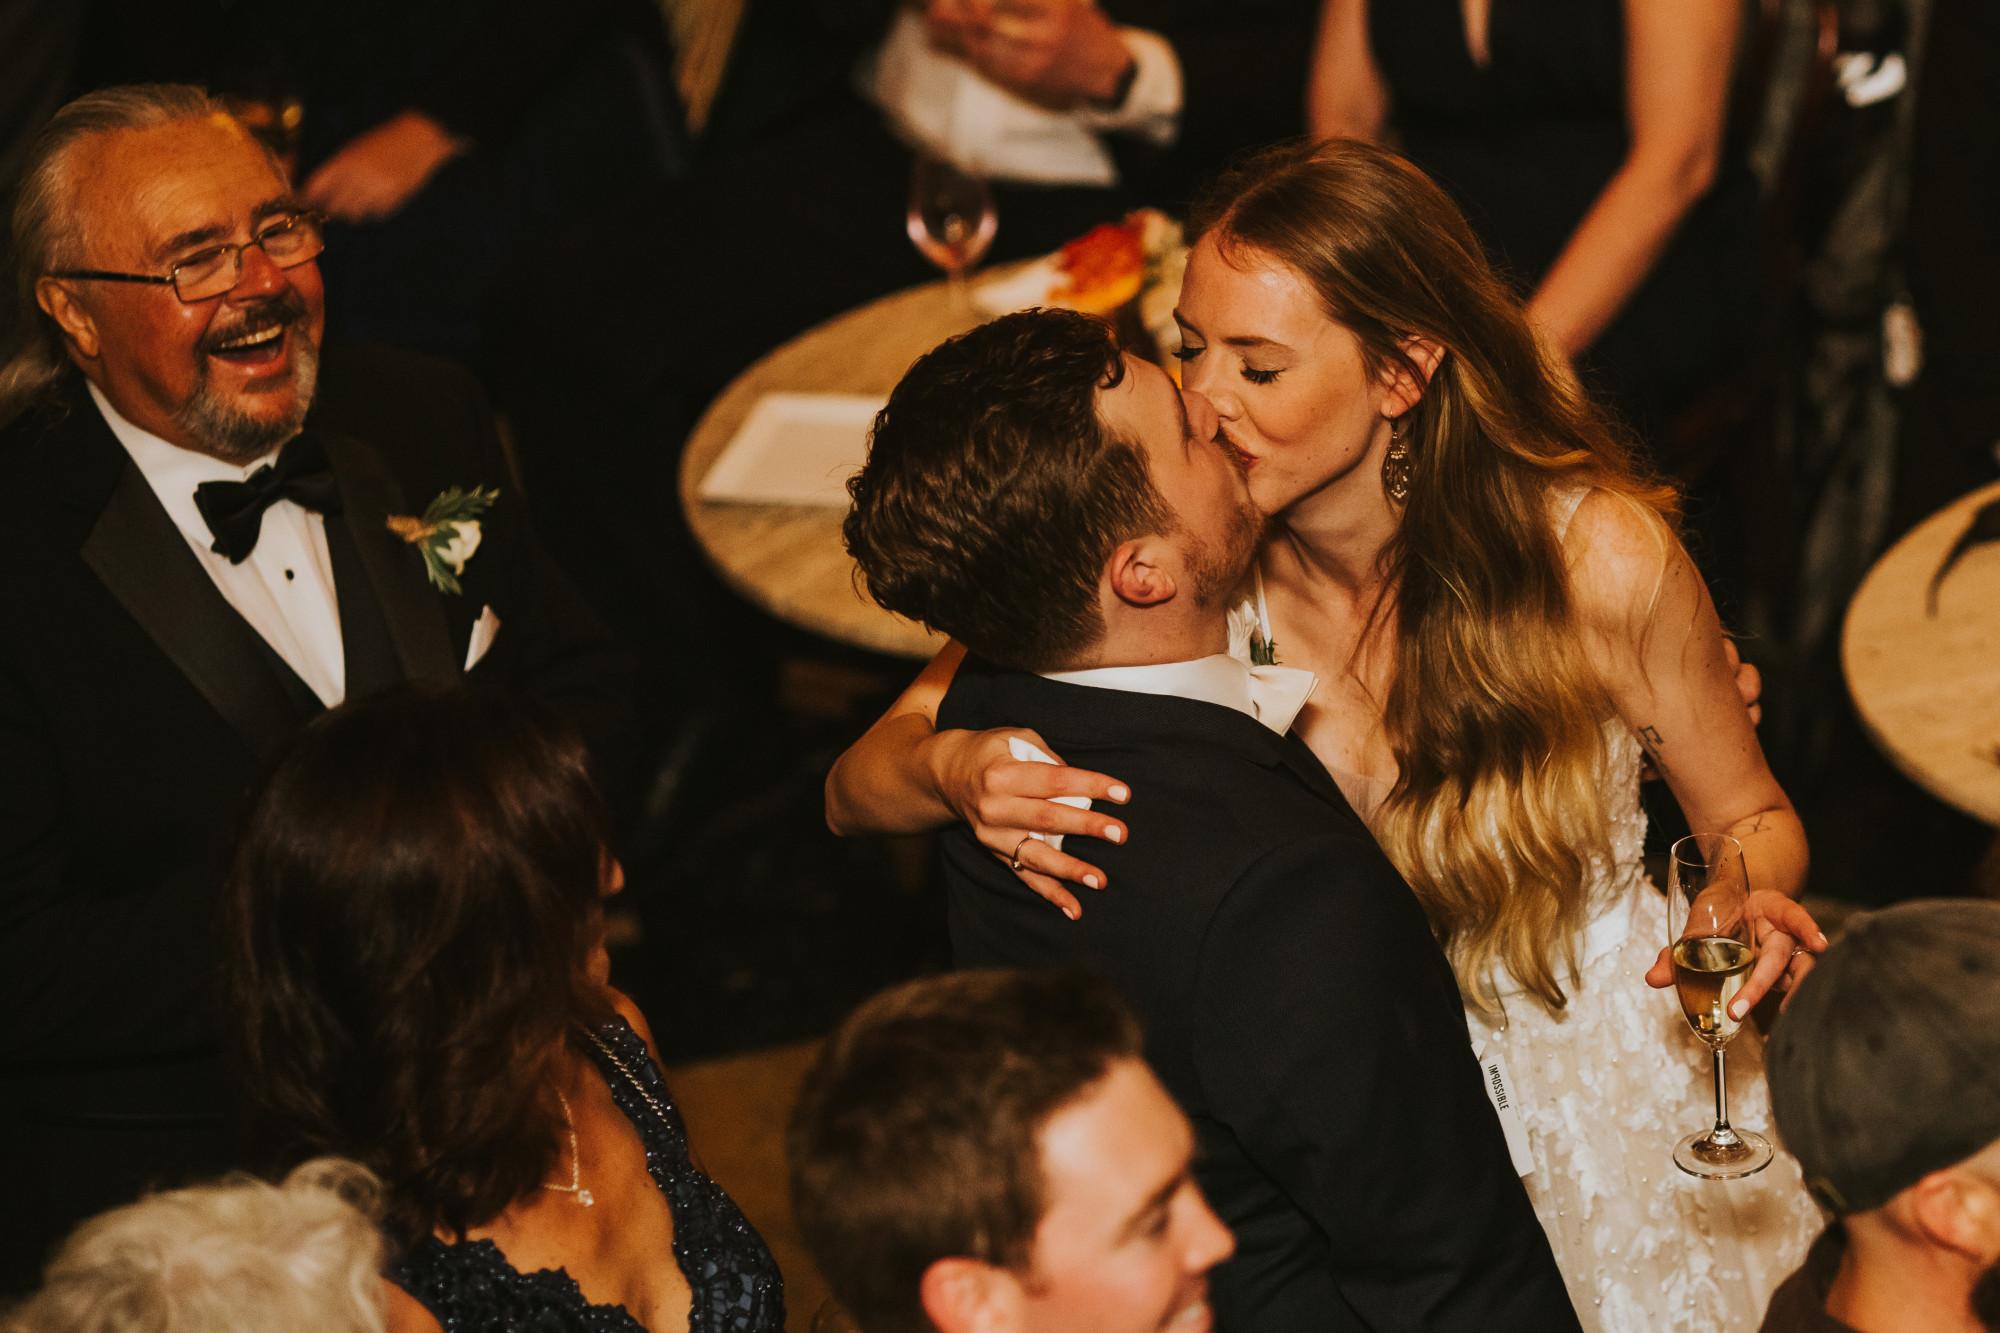 Beth-Ted-Balzacs-Coffee-Distillery-District-Toronto-Wedding-Planning-INLY-Events-Lushana-Bale-Photography-0271.jpg